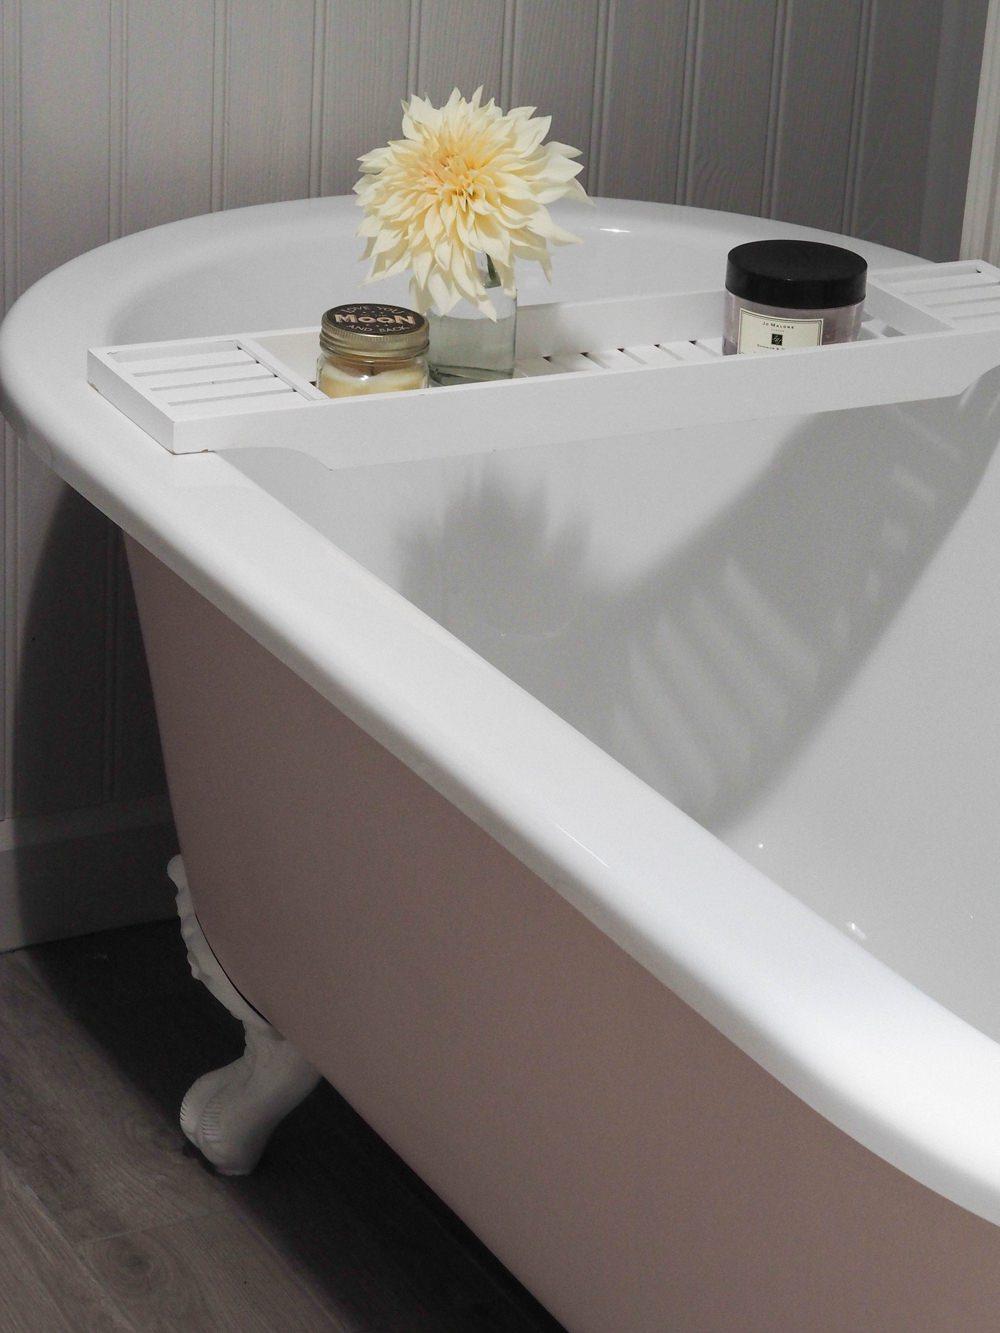 Bath Rack Accessories Bathroom Pink Roll Top Bath Renovation 1930s Brass Taps Panelling Walls Farrow & Ball Floor Tiles